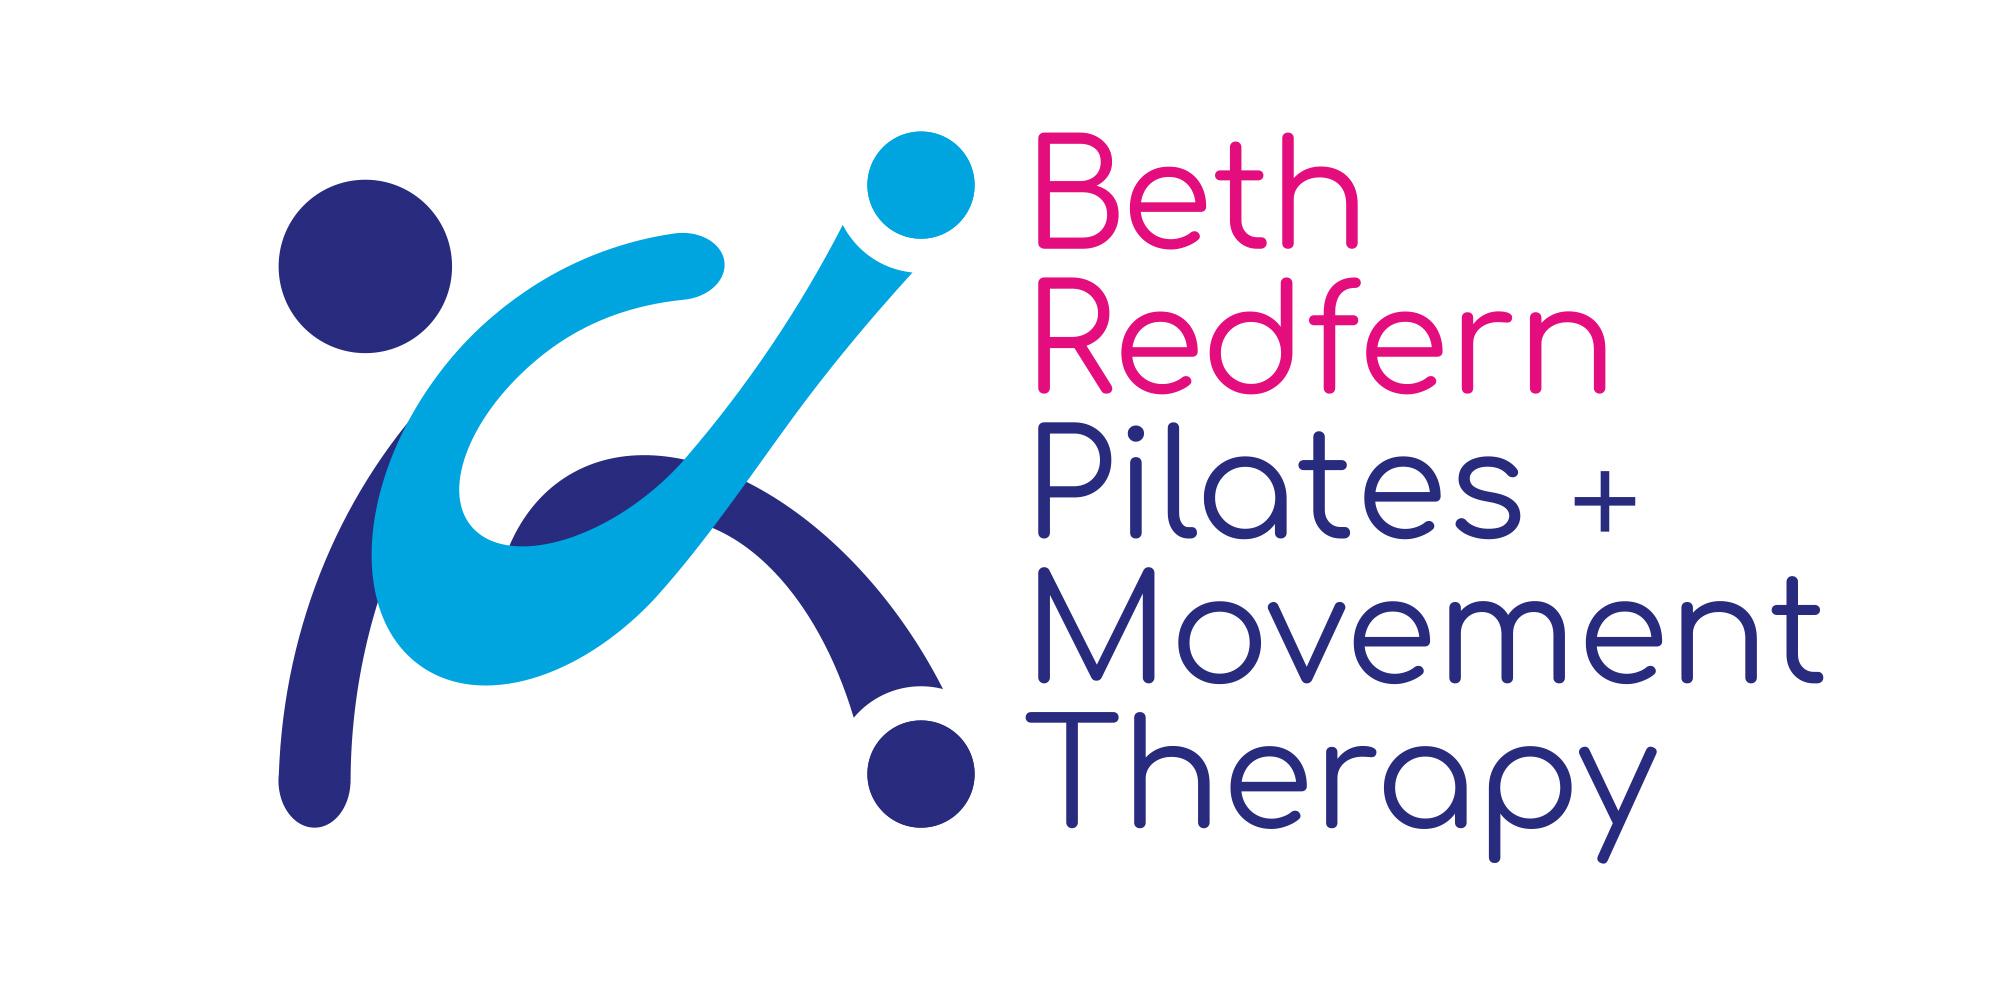 Beth Redfern Pilates